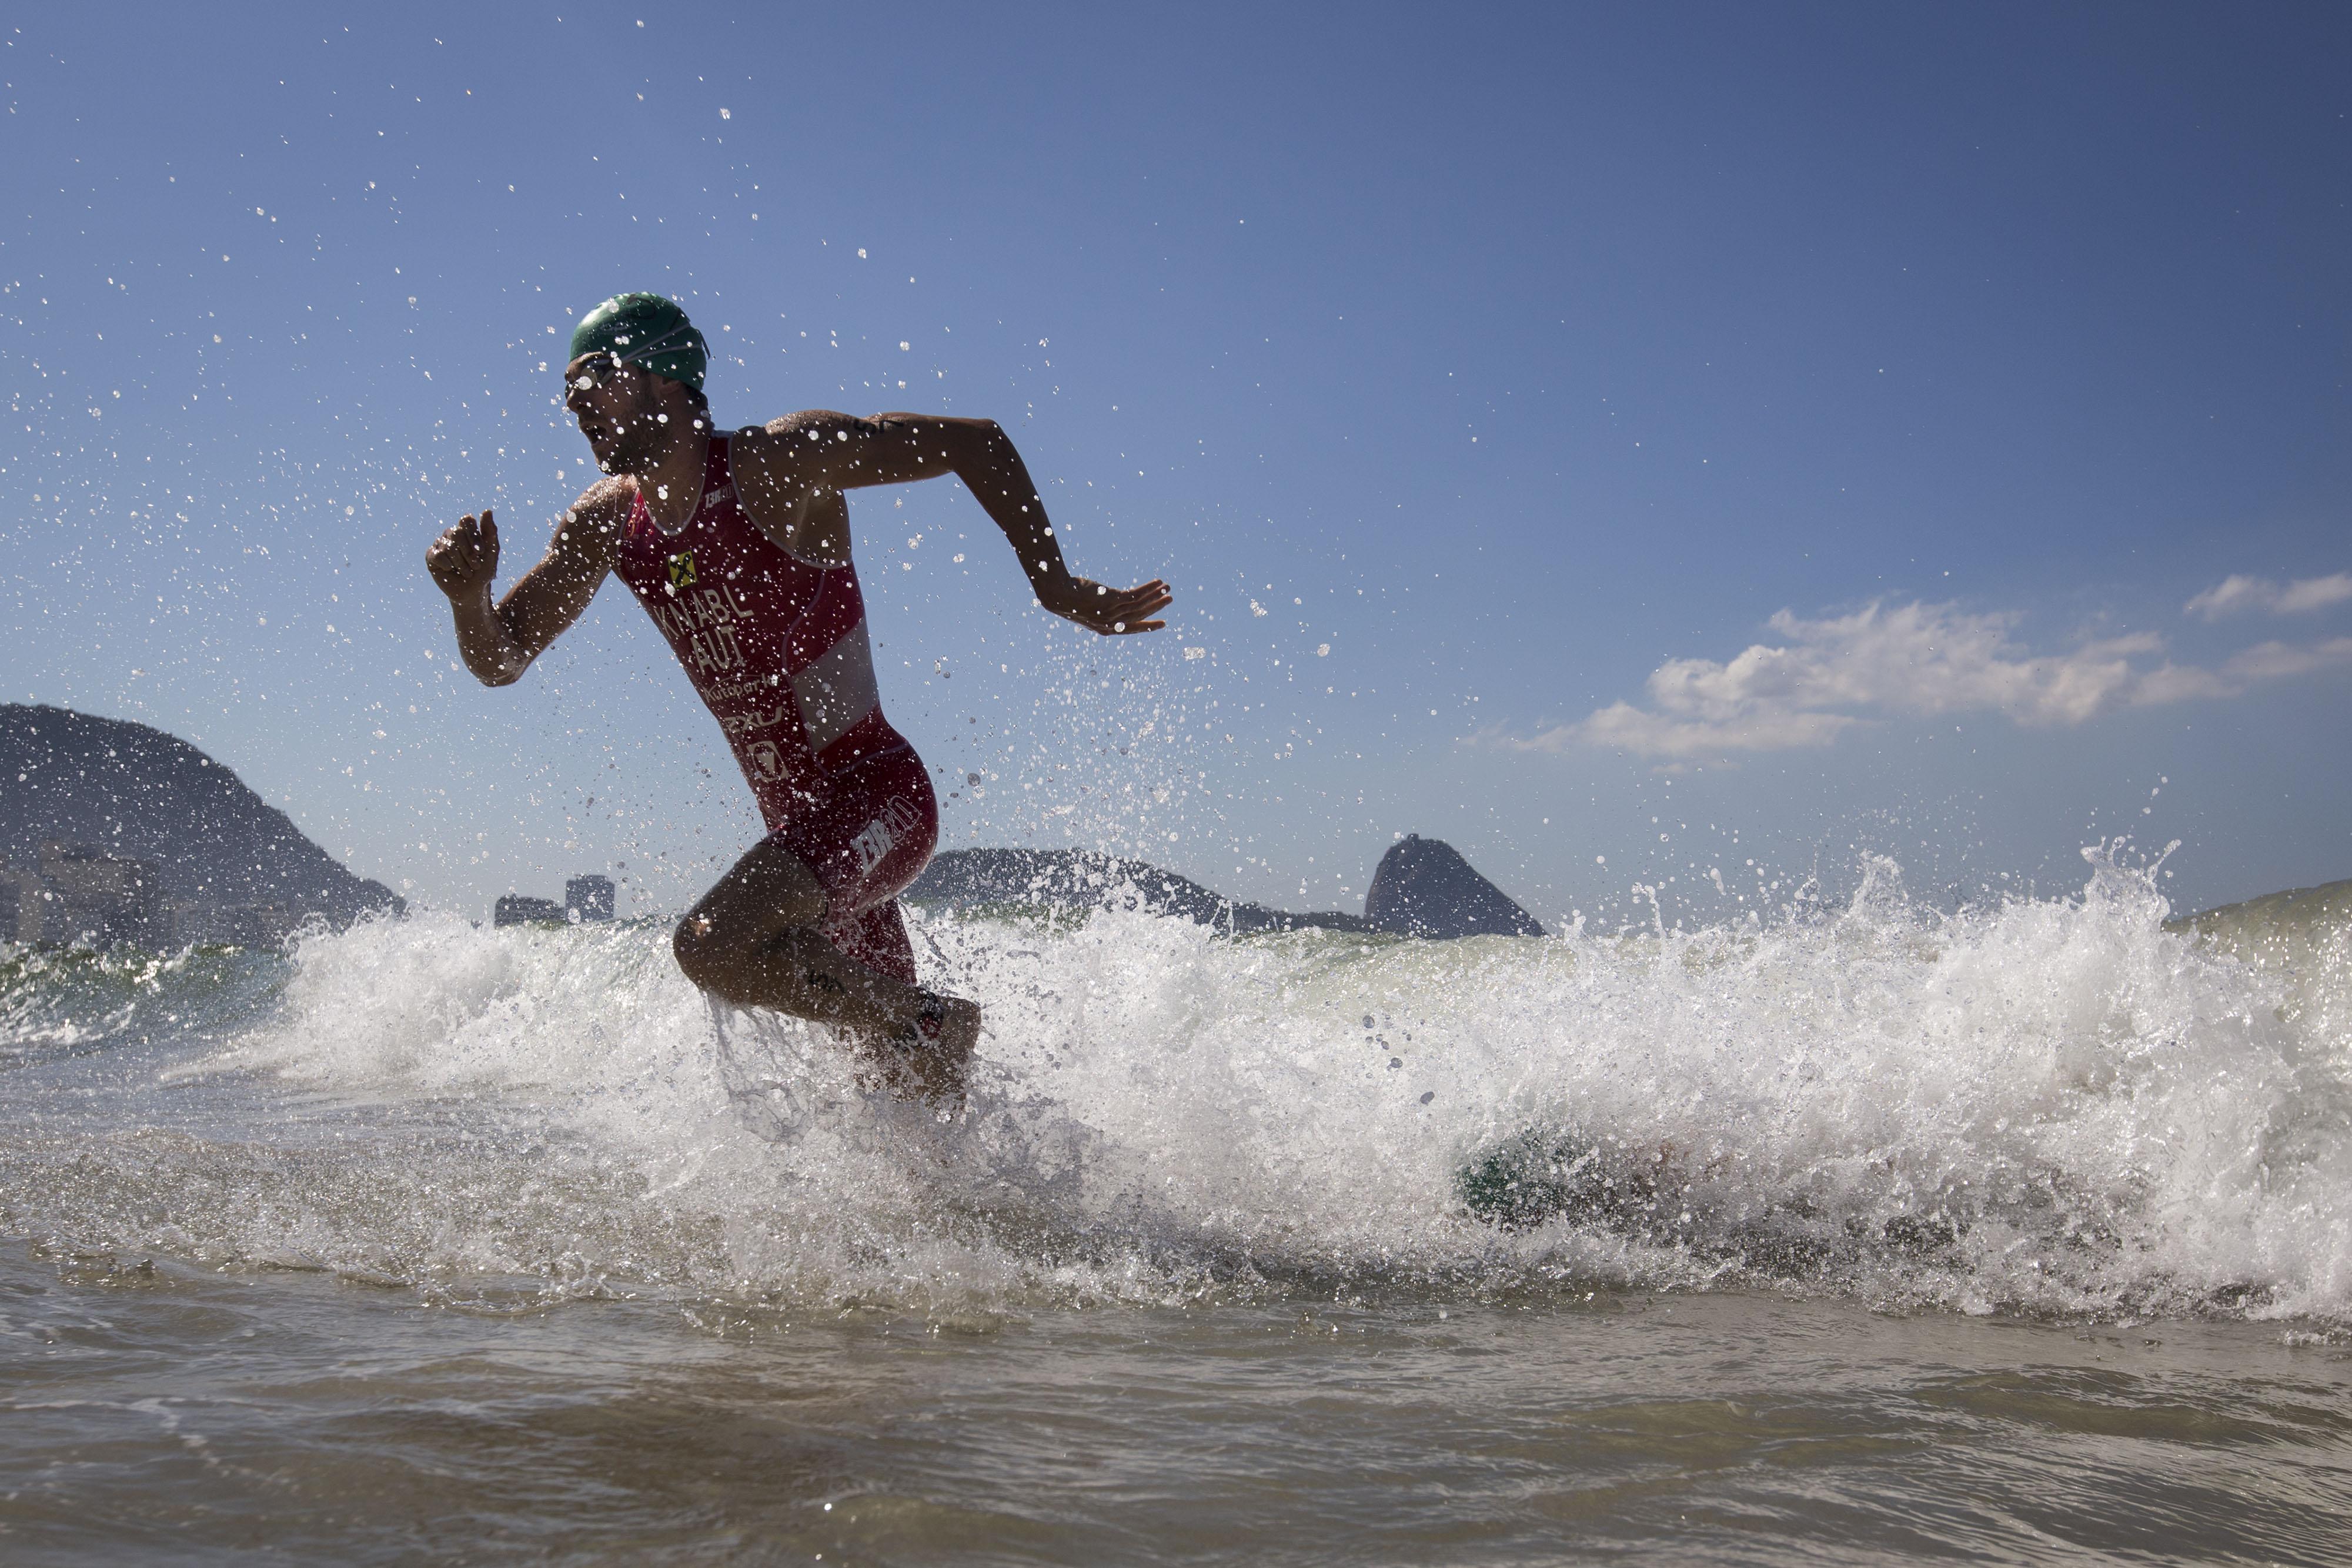 Alois Jnabl of Austria exits the water during the men's triathlon ITU World Olympic Qualification Event in Rio de Janeiro, Brazil, Sunday, Aug. 2, 2015. The World Olympic Qualification is a test event for the Rio 2016 Olympics. (AP Photo/Felipe Dana)